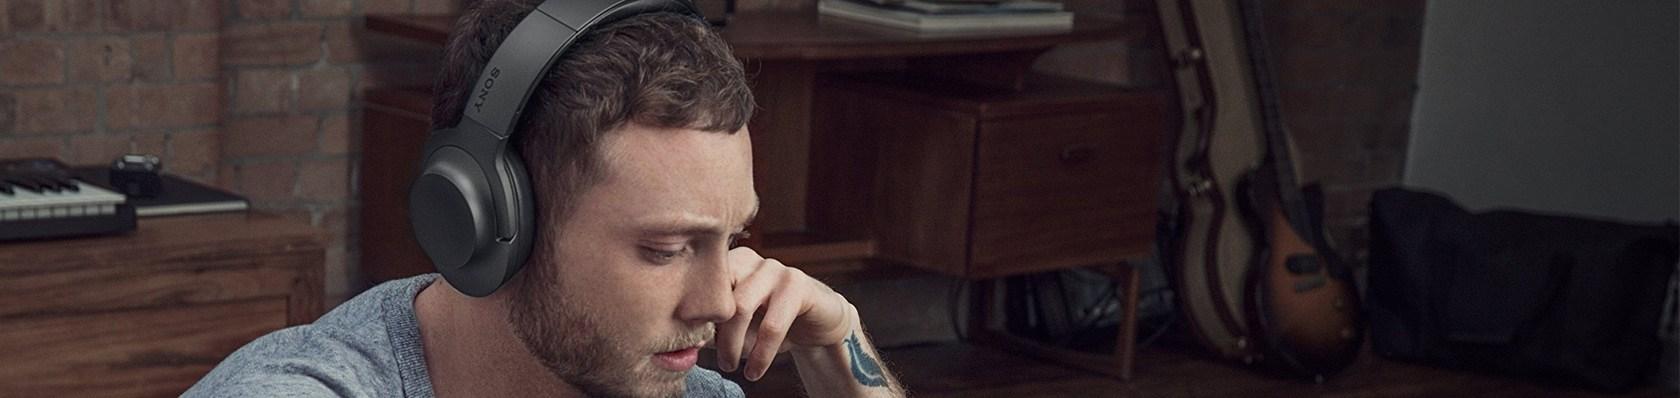 On-Ear-Kopfhörer im Test auf ExpertenTesten.de